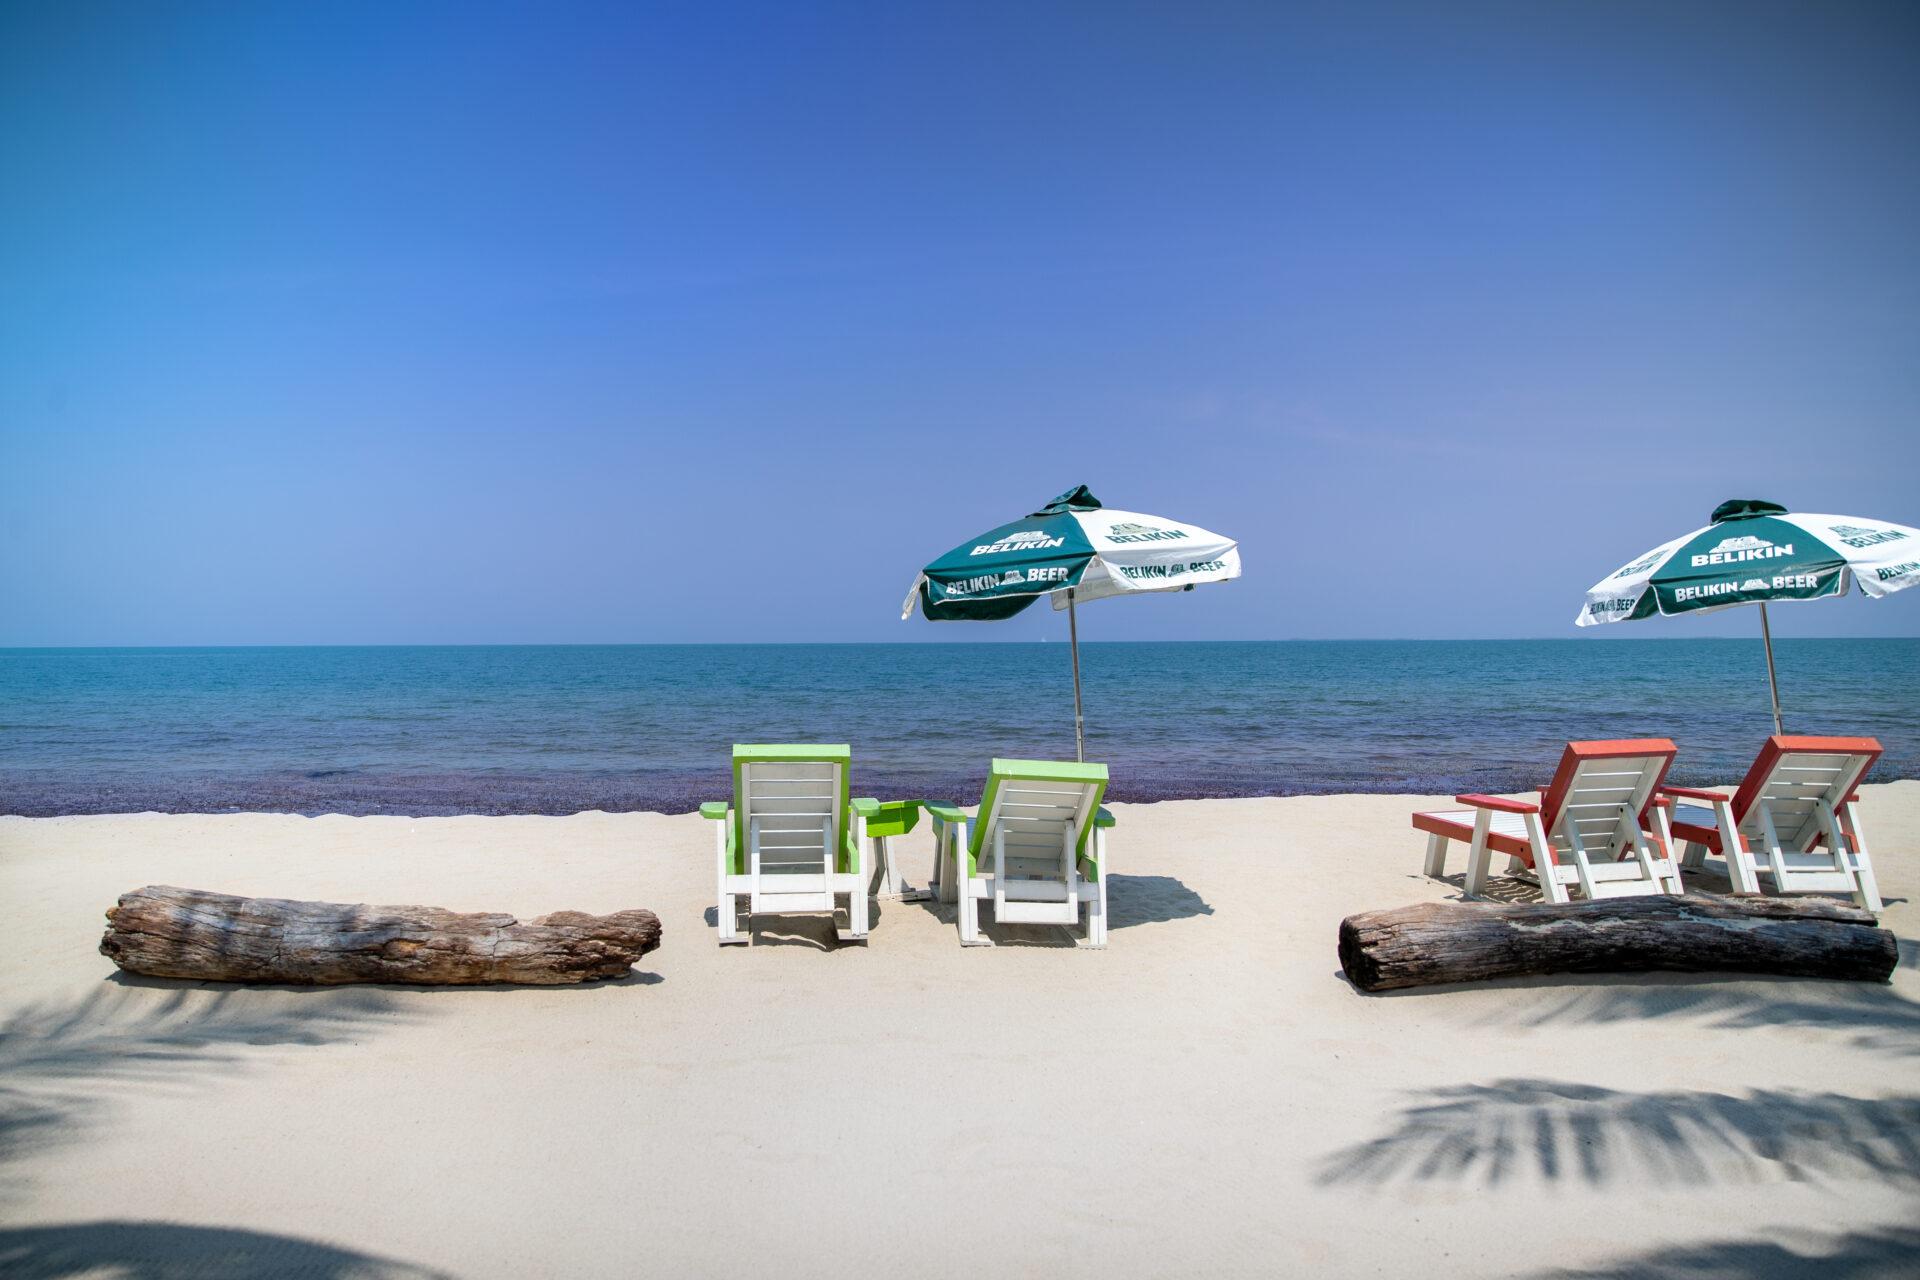 tipsy-tuna-beach-placencia-belize-dylan-hetelle-muyono